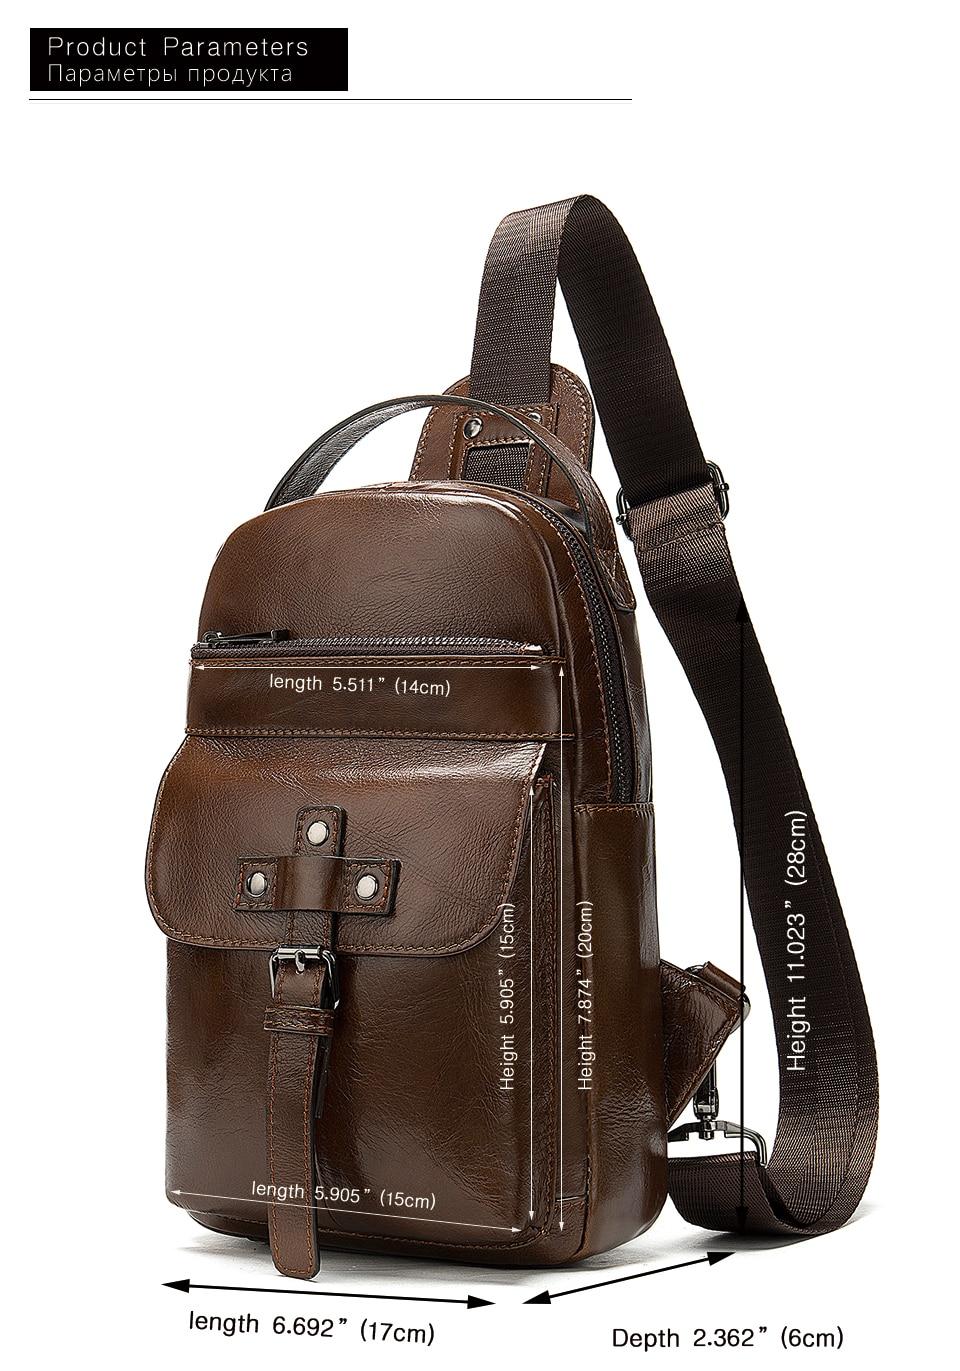 4 Men's Bag Leather Sling Bag Caual Men's Shoulder Bag Vintage Crossbody Bags for Men with Headphone Hole Travel Chest Pack